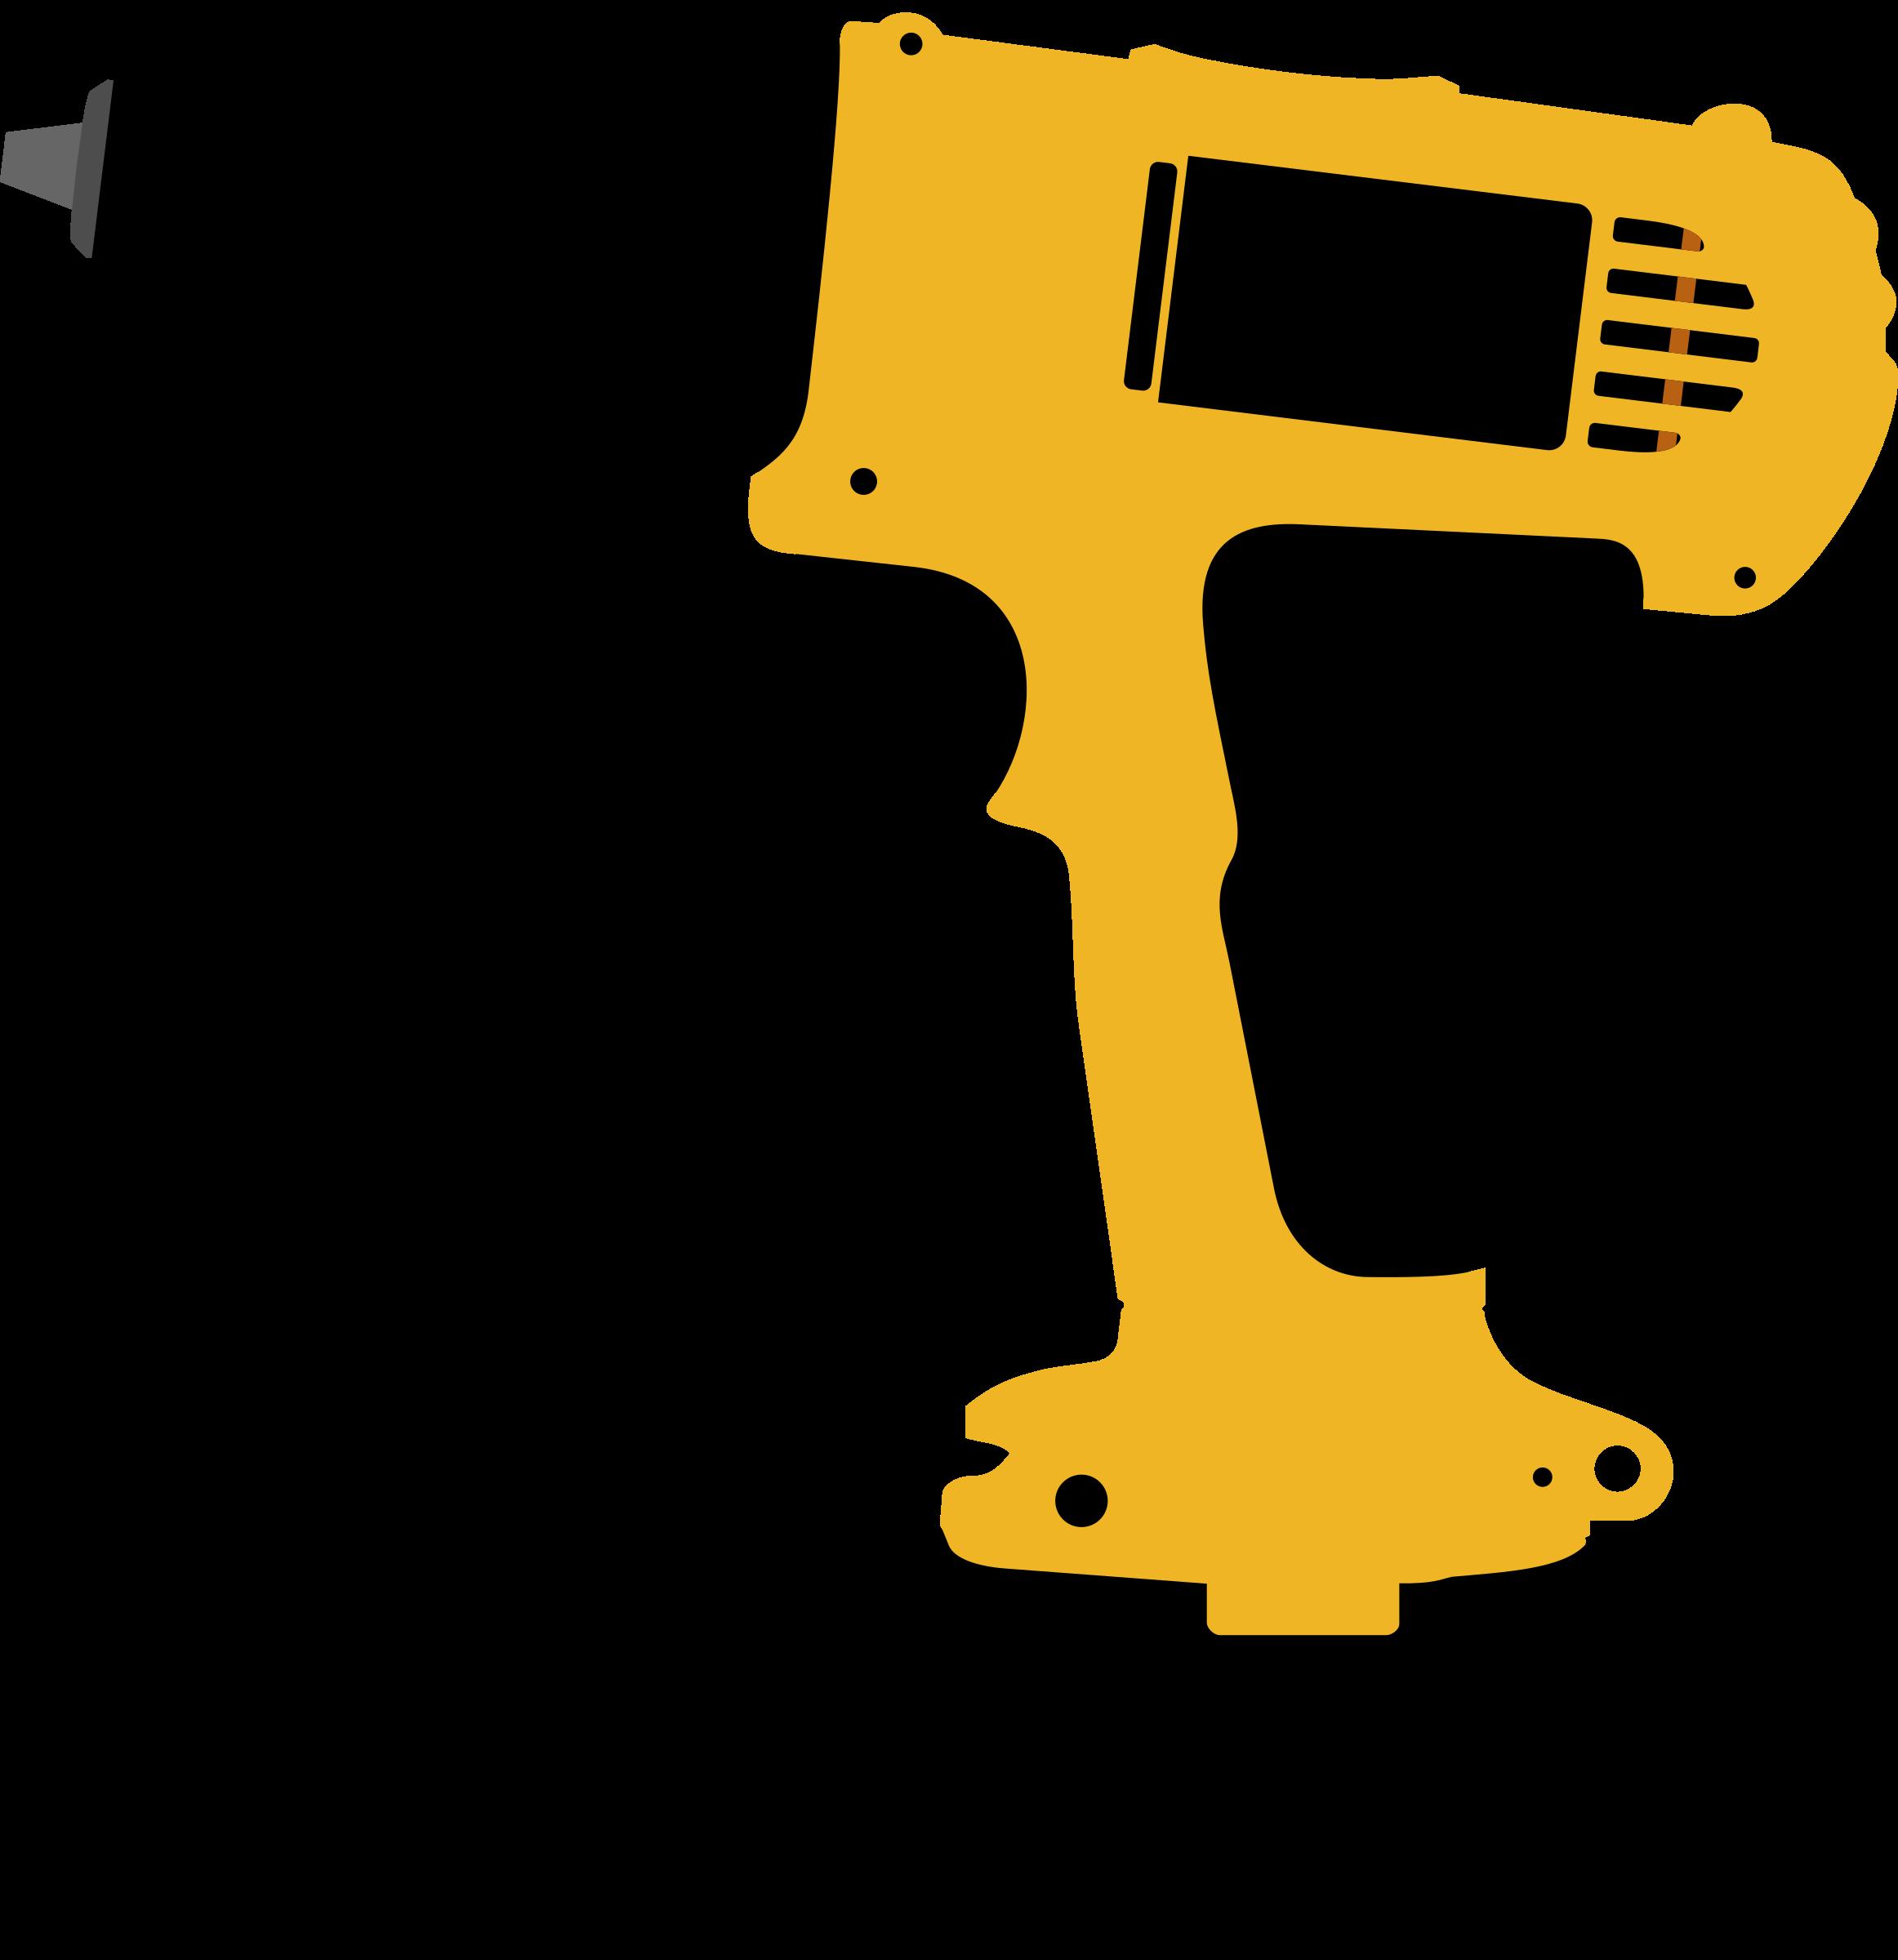 Clipart hammer hammer screwdriver. Electric big image png